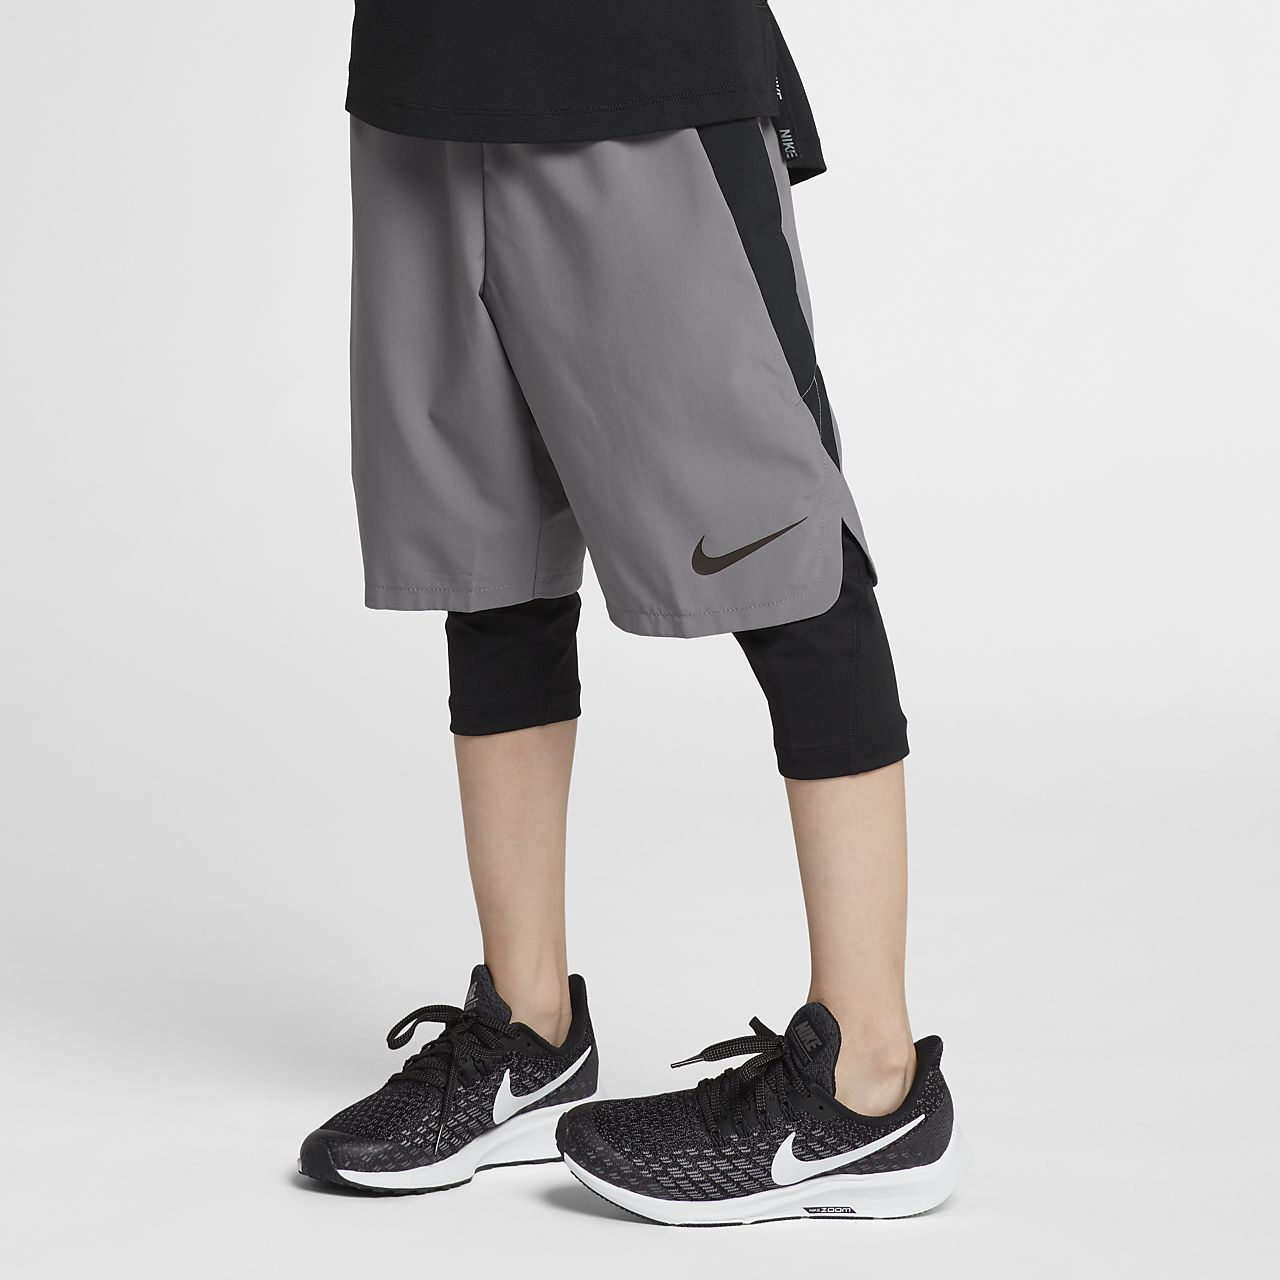 Nike Trainingsshorts für ältere Kinder (Jungen) (ca. 20,5 cm)